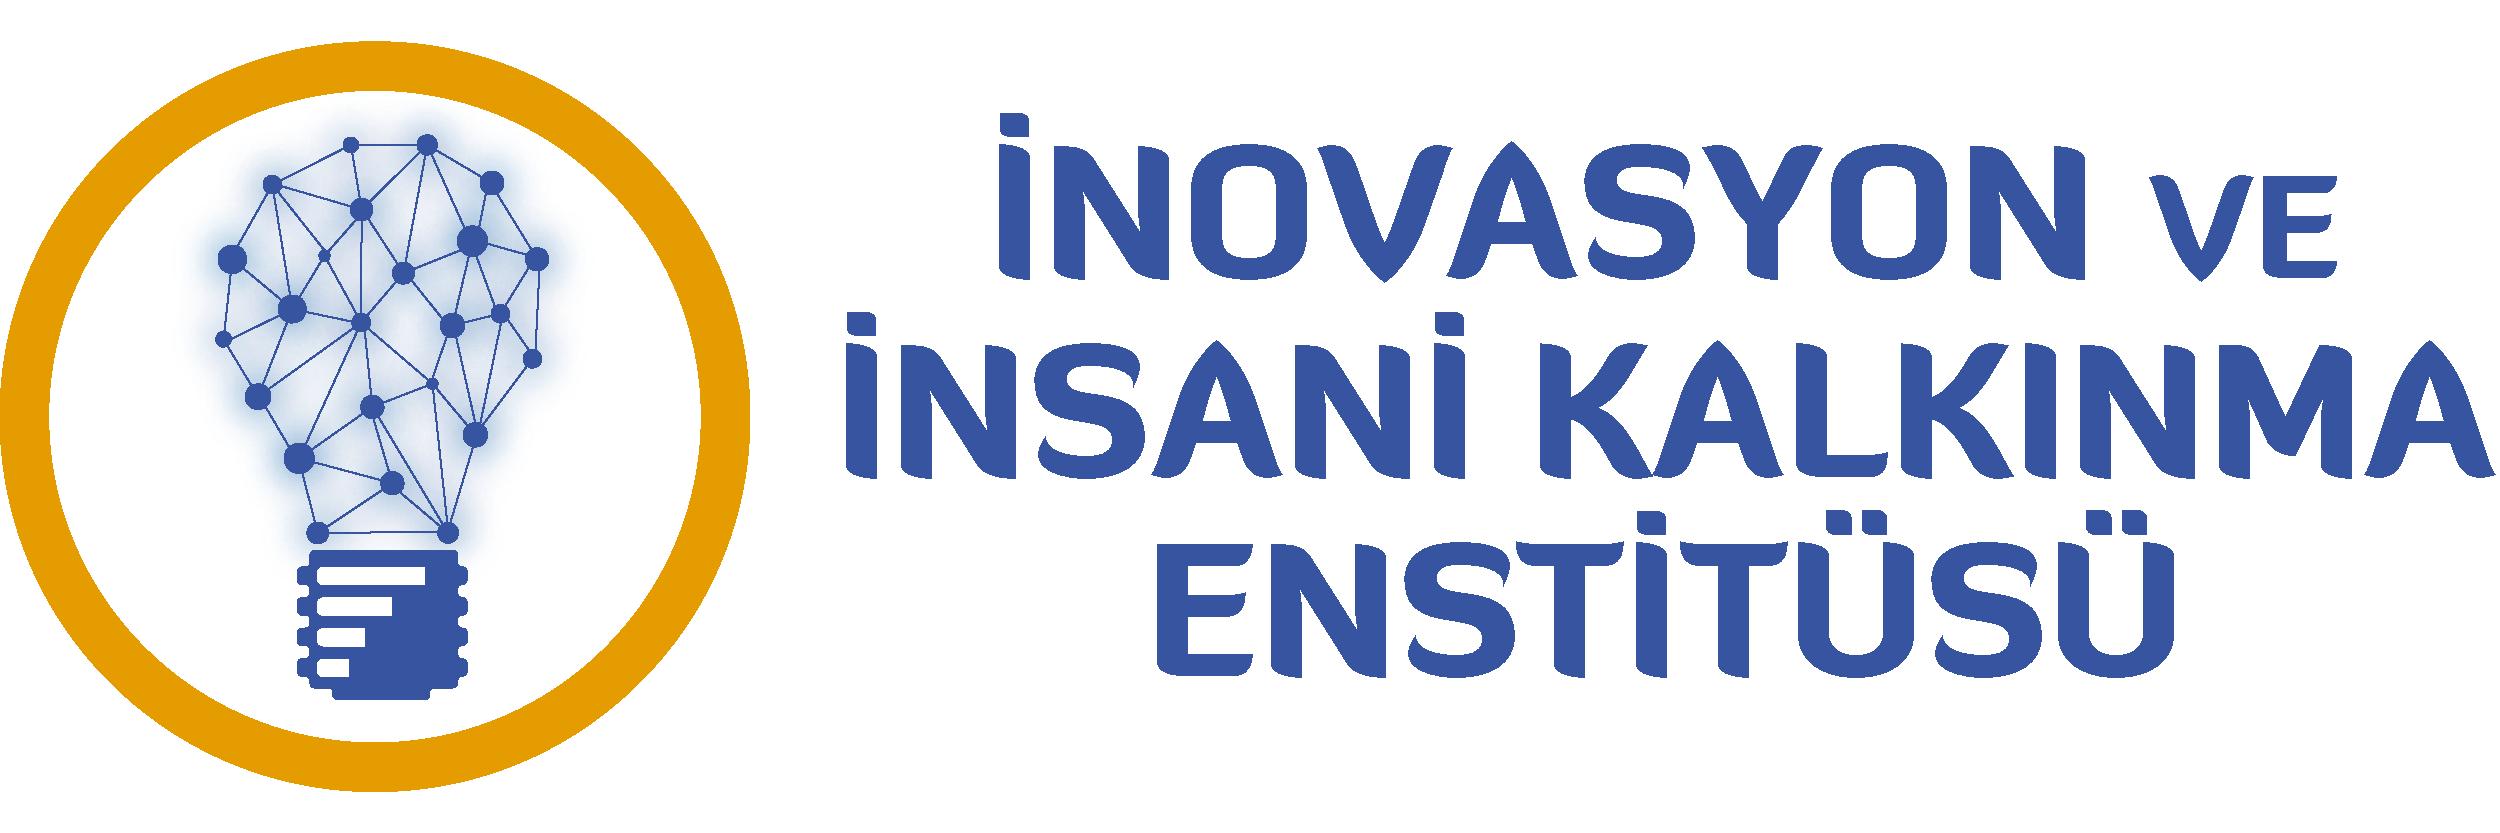 İnovasyon ve İnsani Kalkınma Enstitüsü